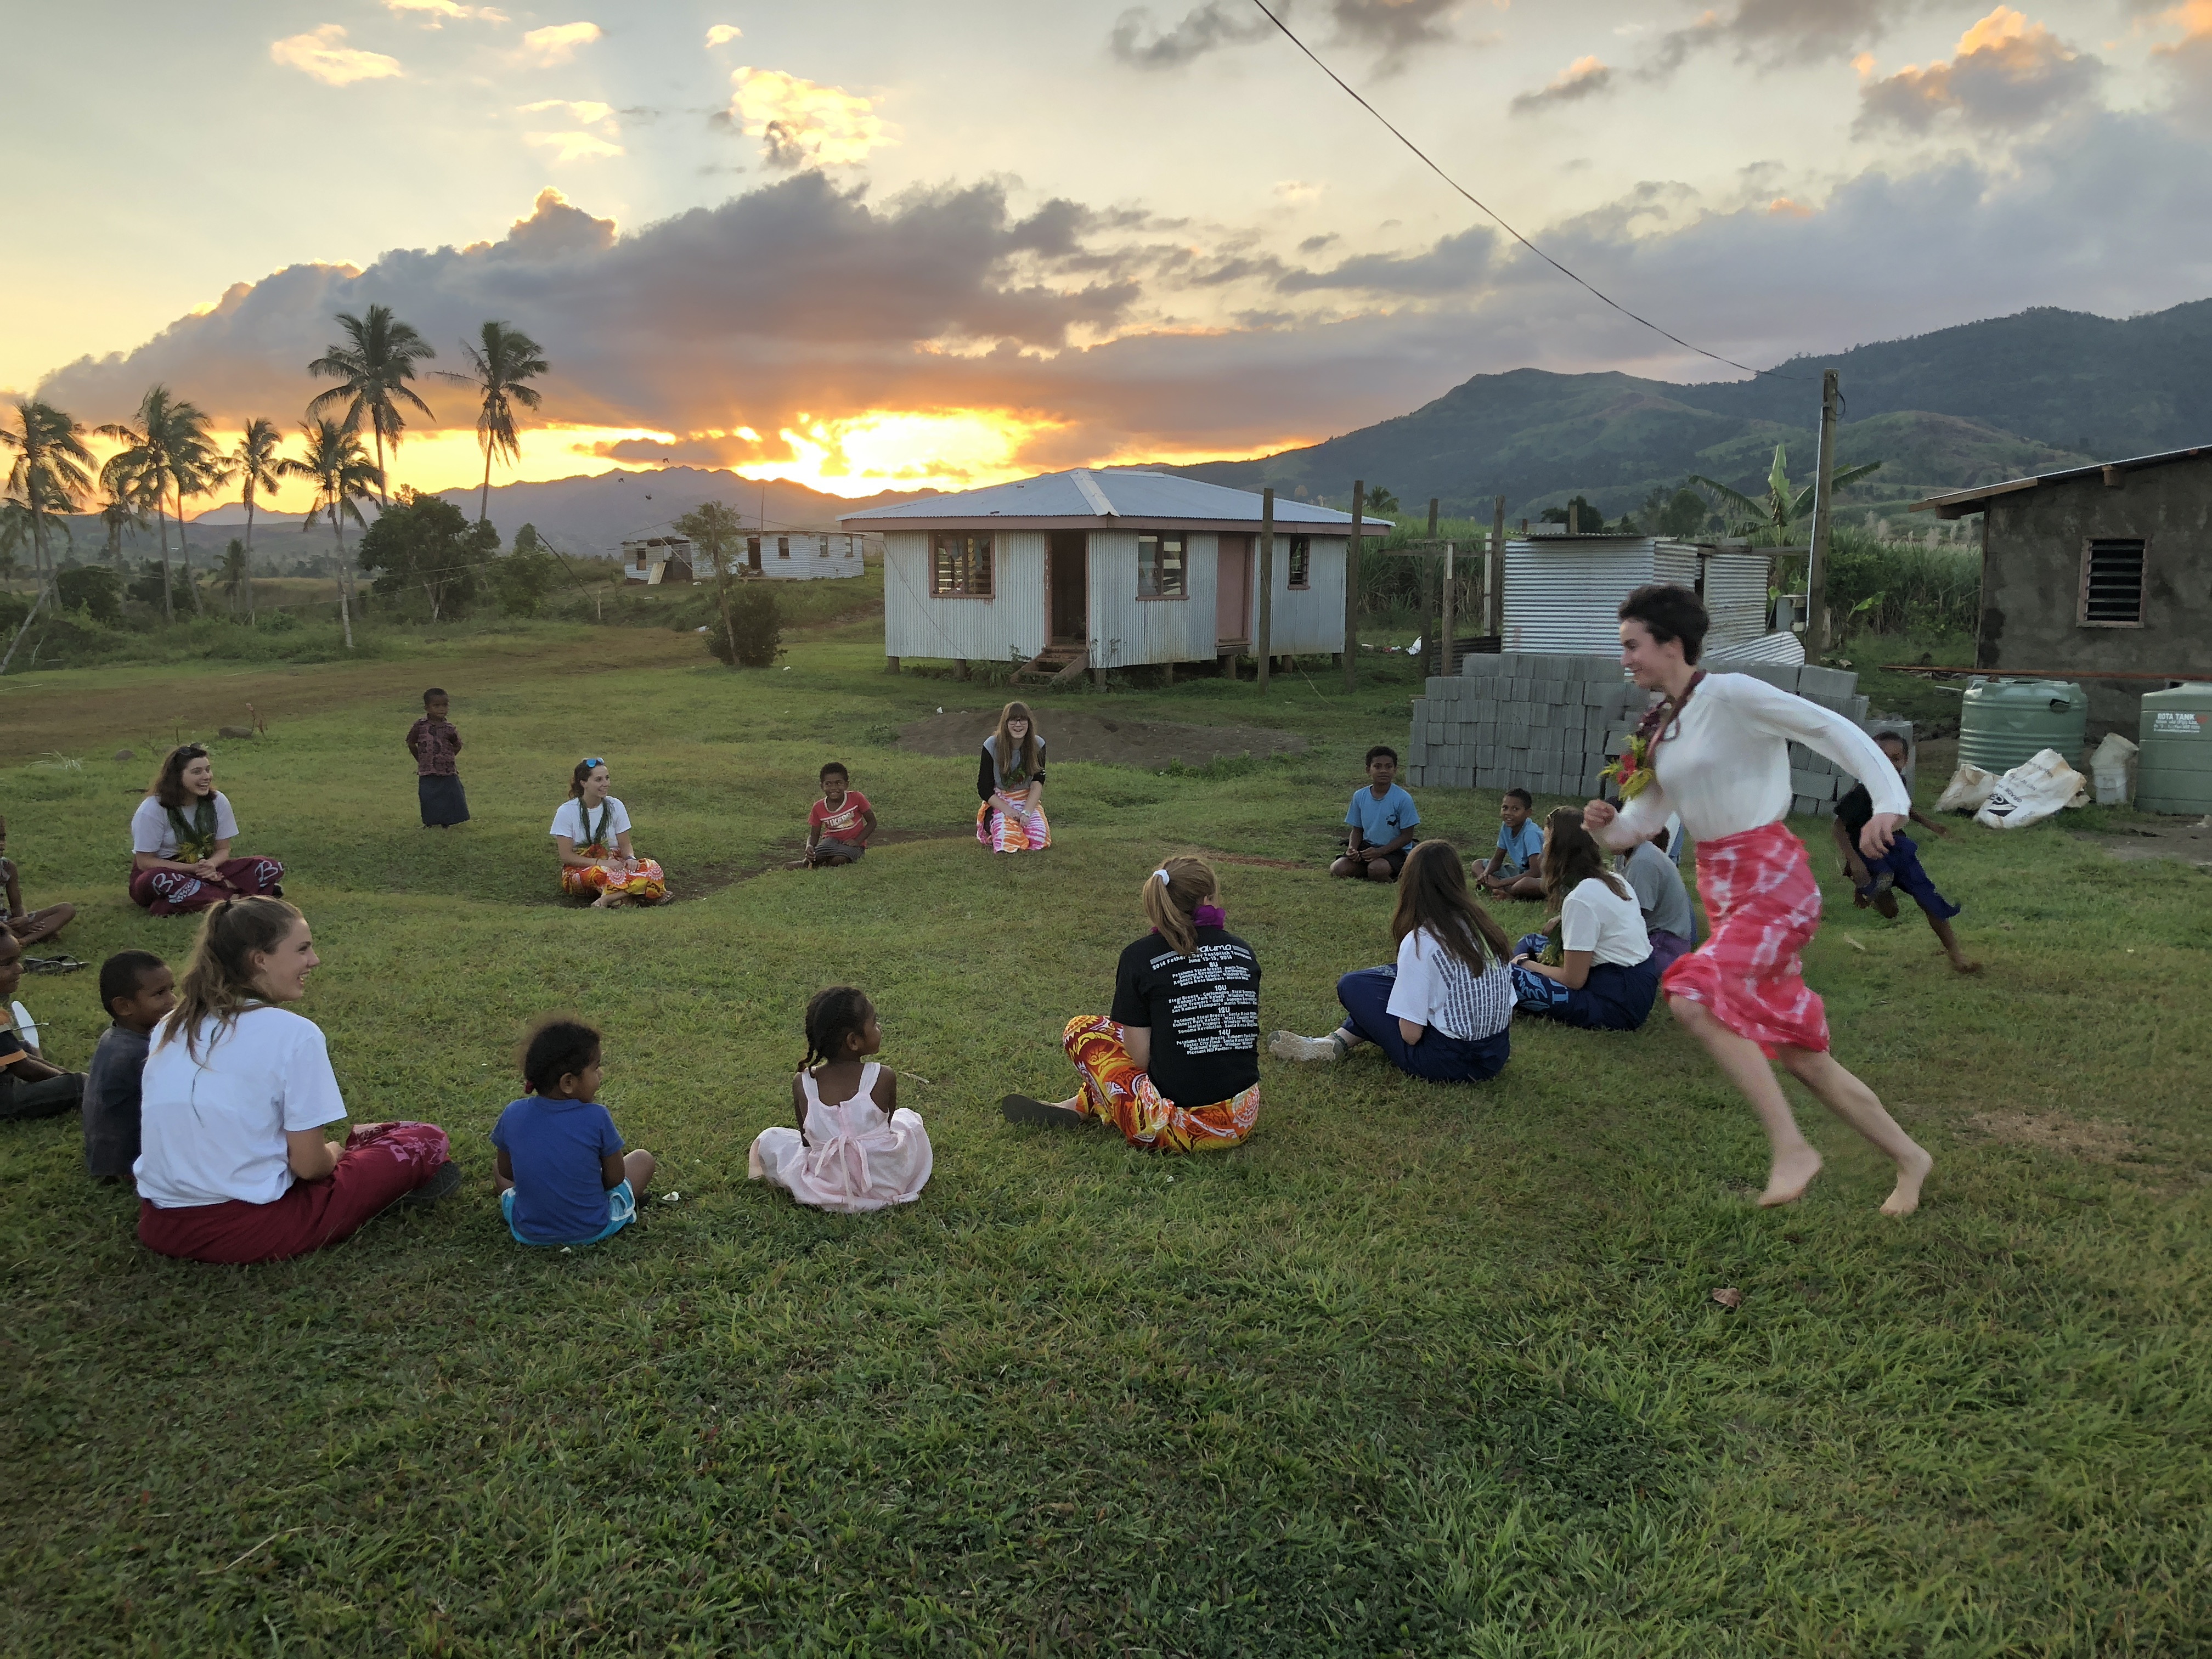 Summer Program - Literacy and Education | Global Works - Fiji Islands: Building Community